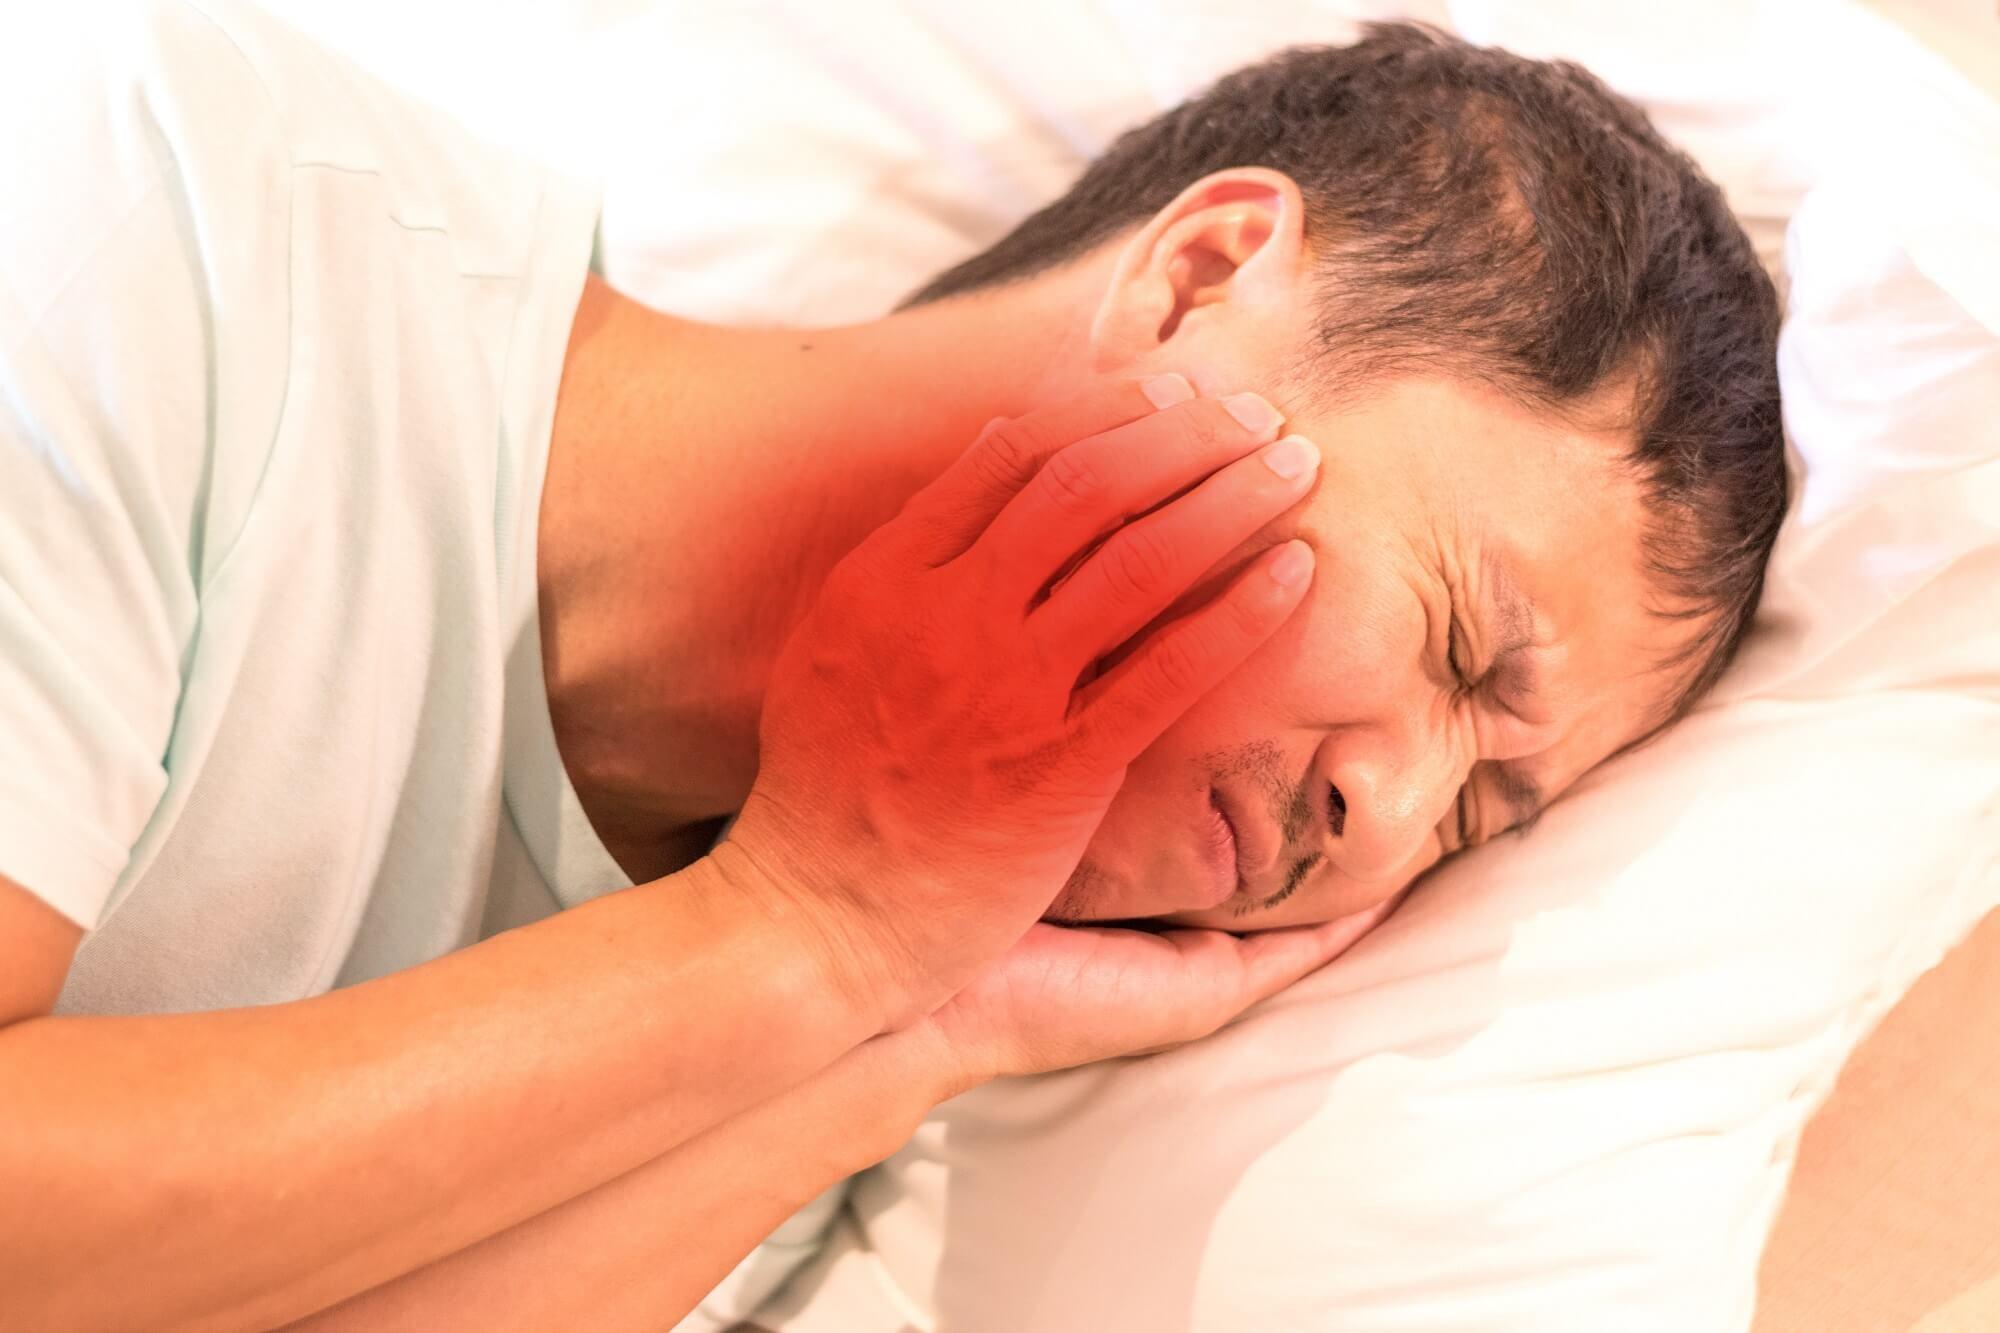 Generalized Mechanical Hyperalgesia in Chronic Migraine, Temporomandibular Disorder